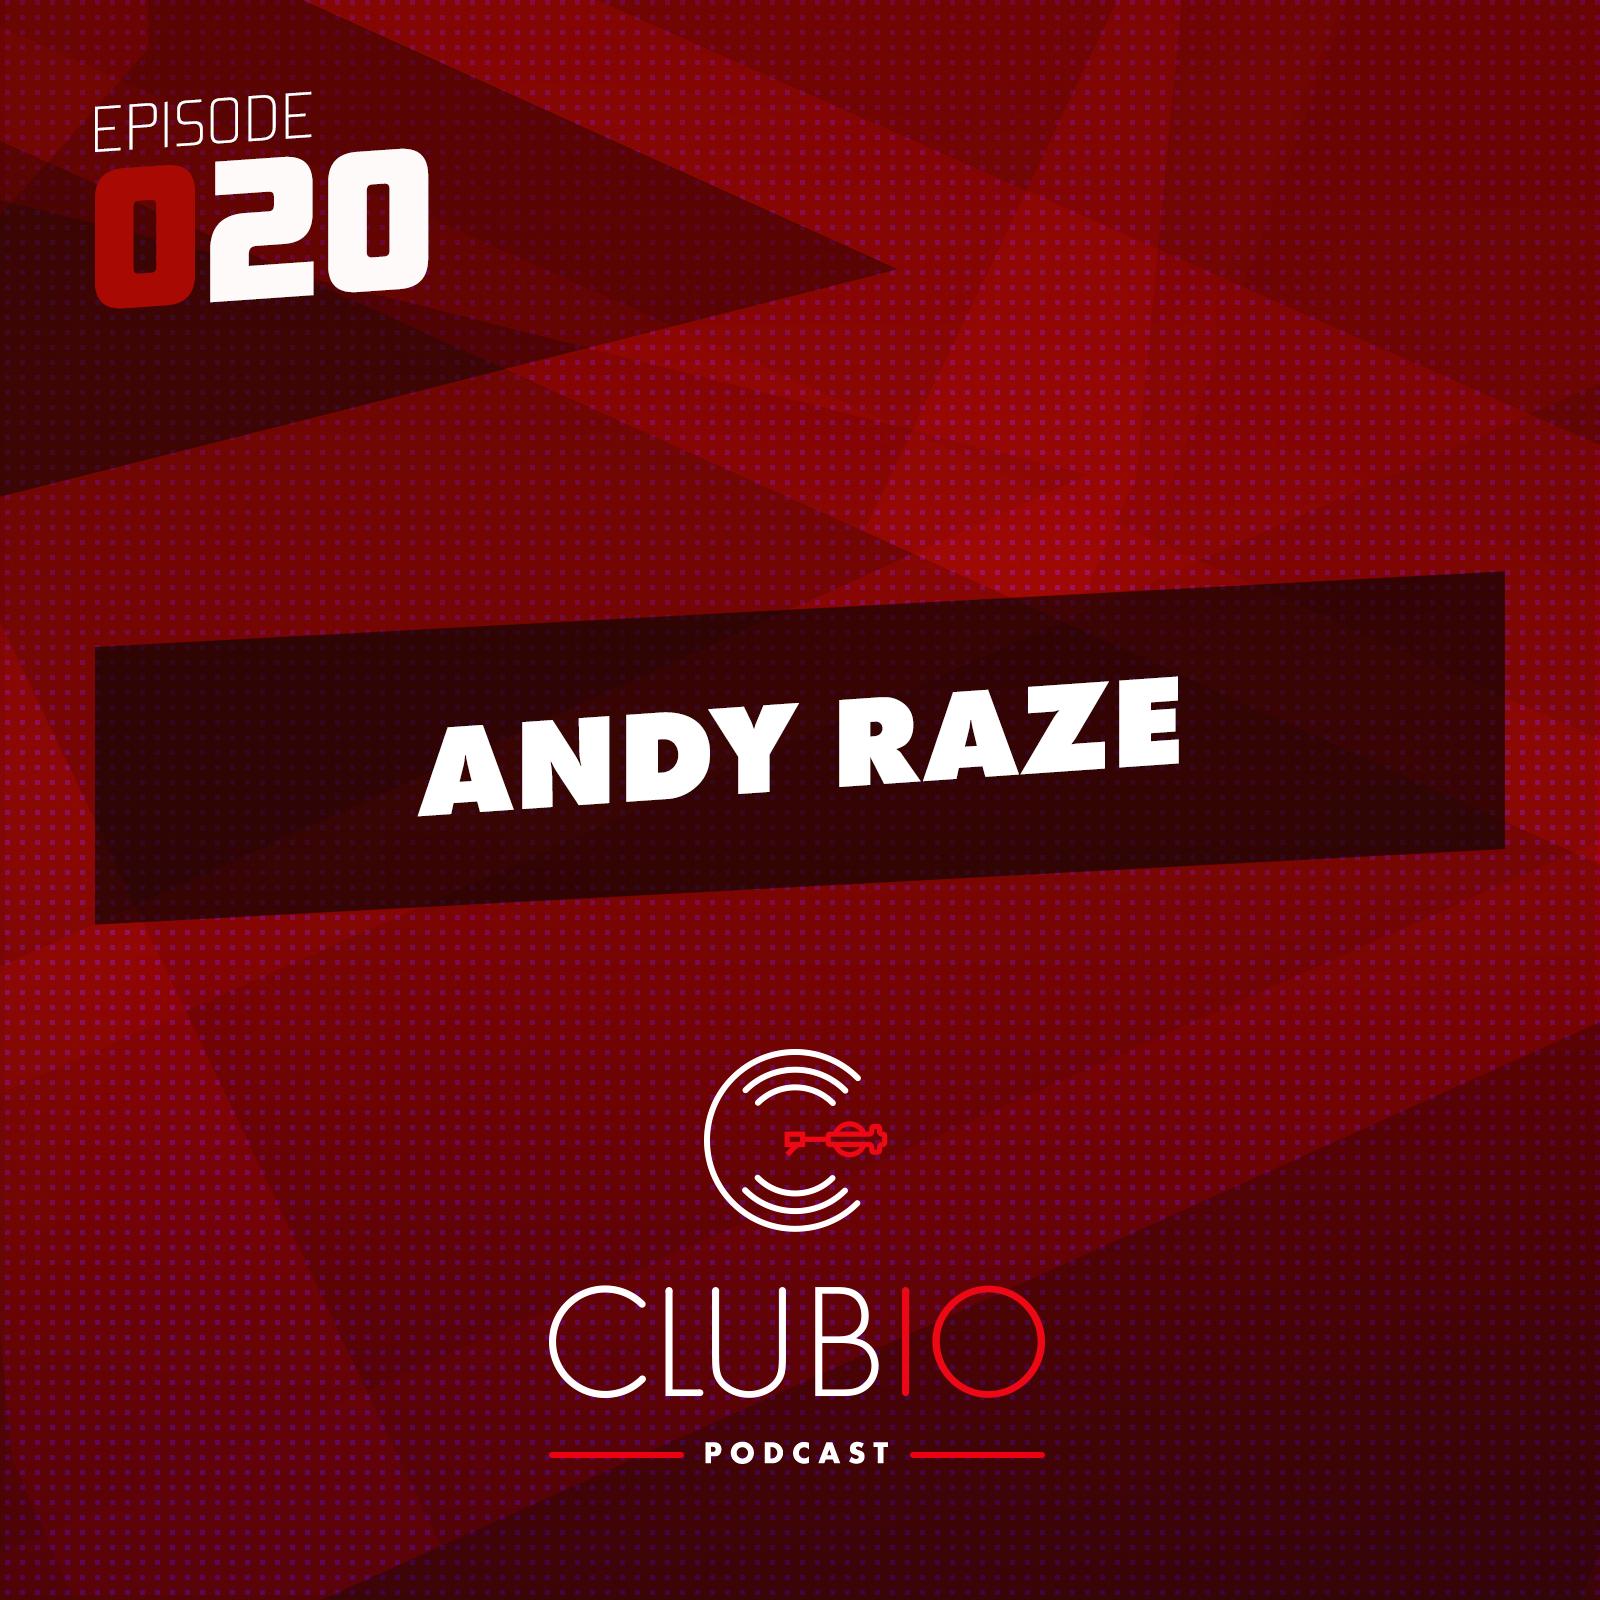 Clubio Podcast 020 - Andy Raze